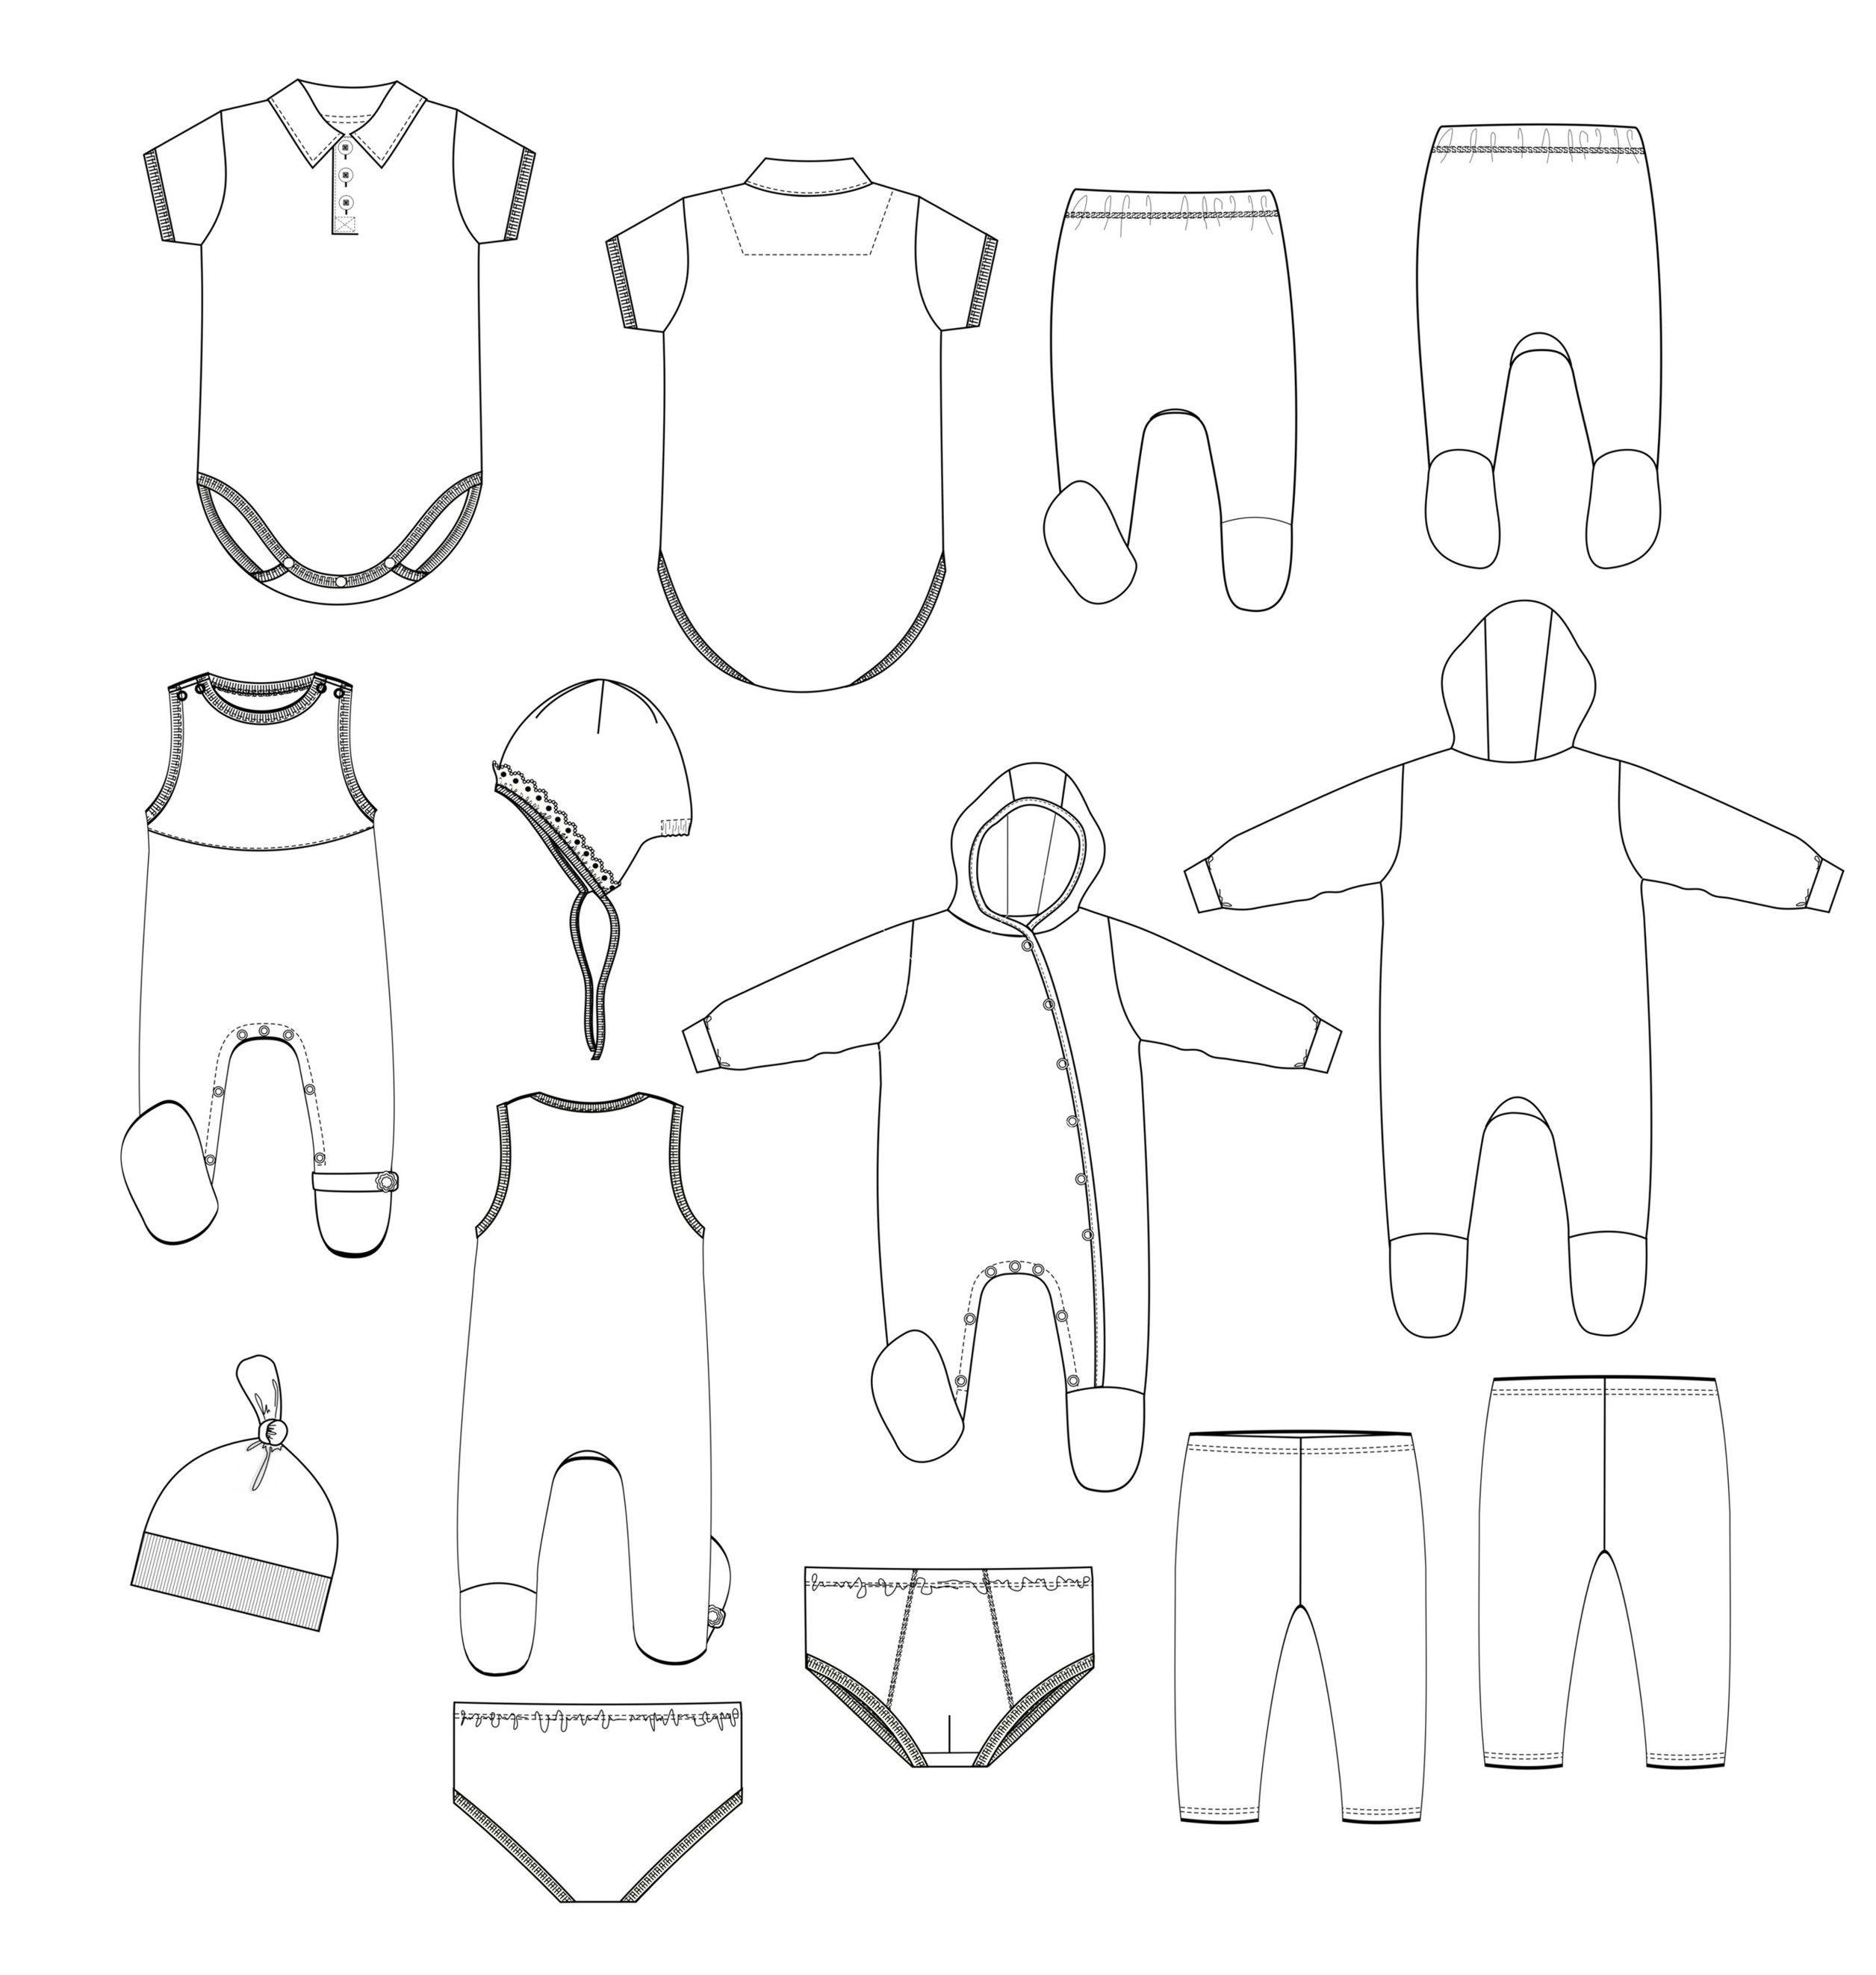 kids-underwear-vector-1129748.jpg (2512×2644)   DIBUJOS TECNICOS ...